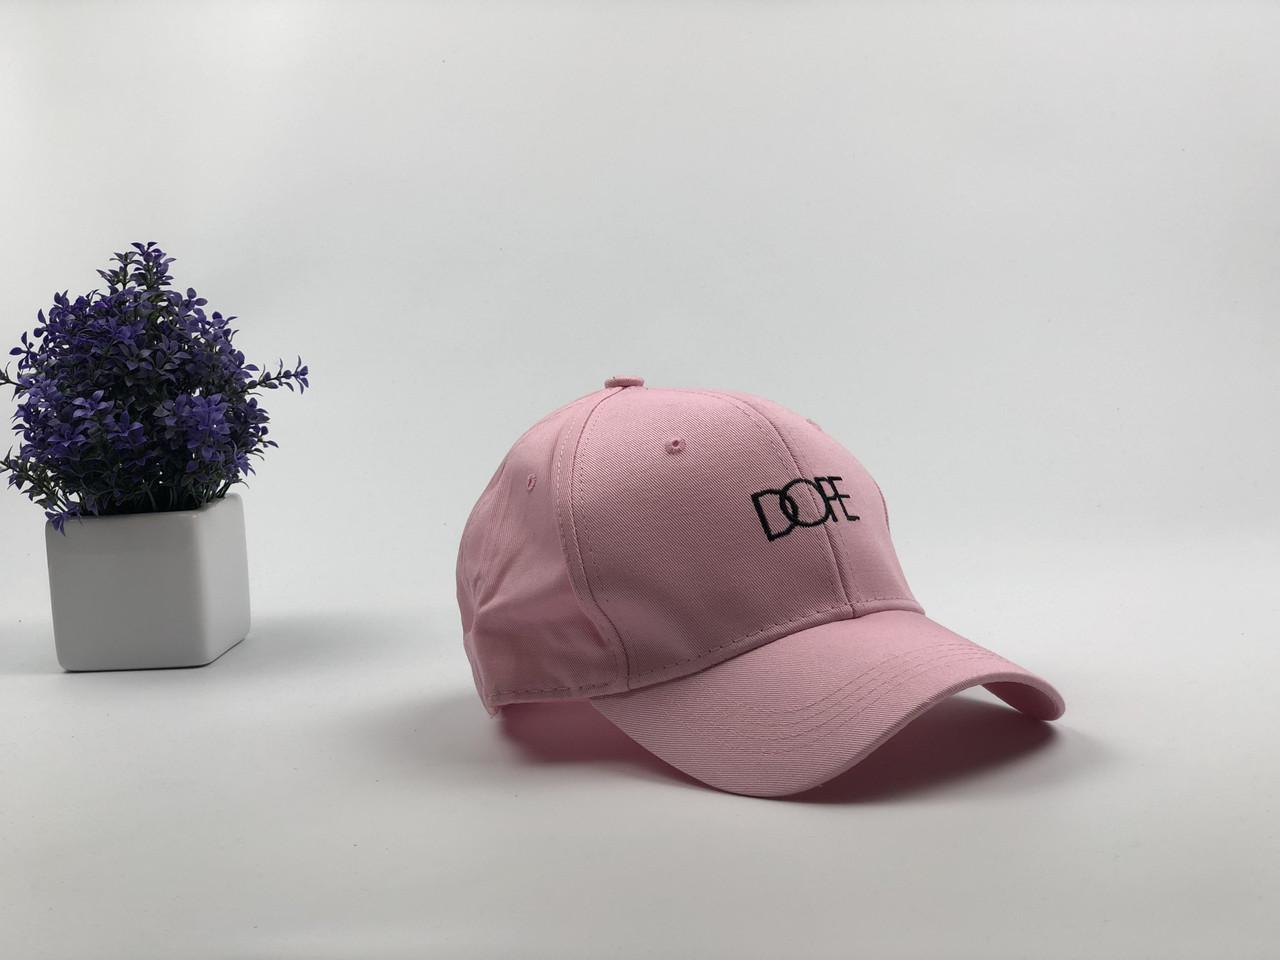 Кепка бейсболка Dope (розовая)